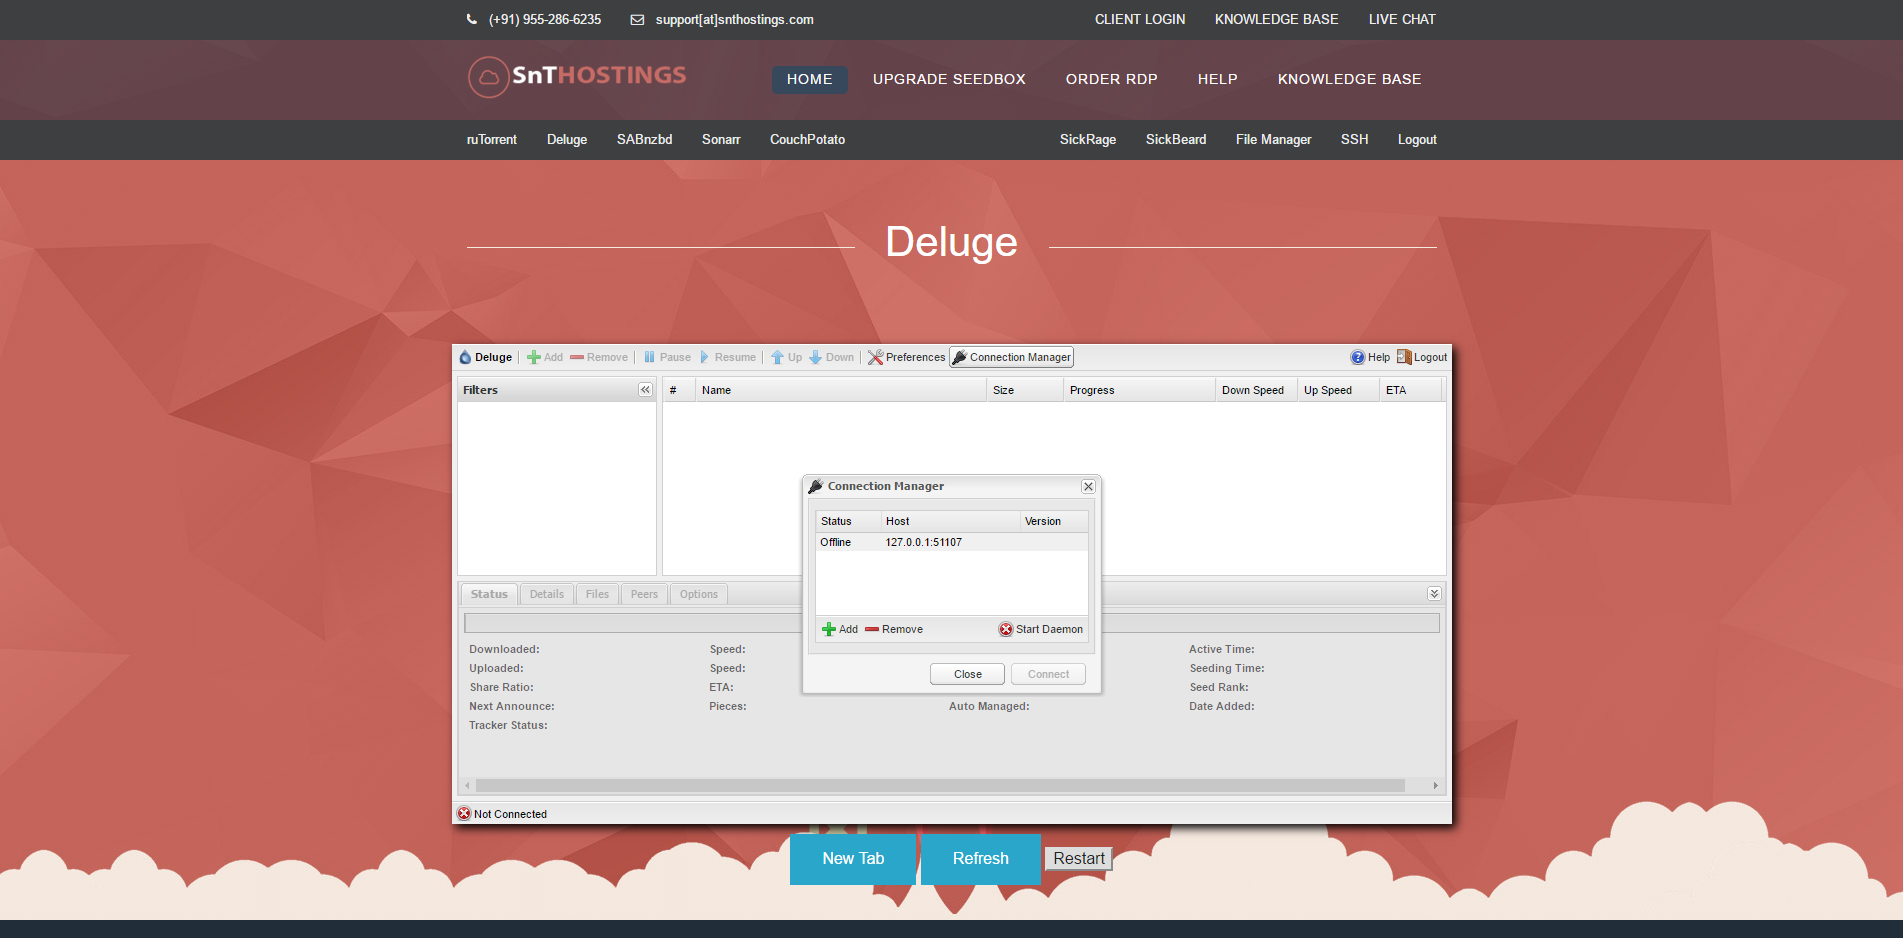 How to use Deluge via Seedbox Panel? - Knowledgebase